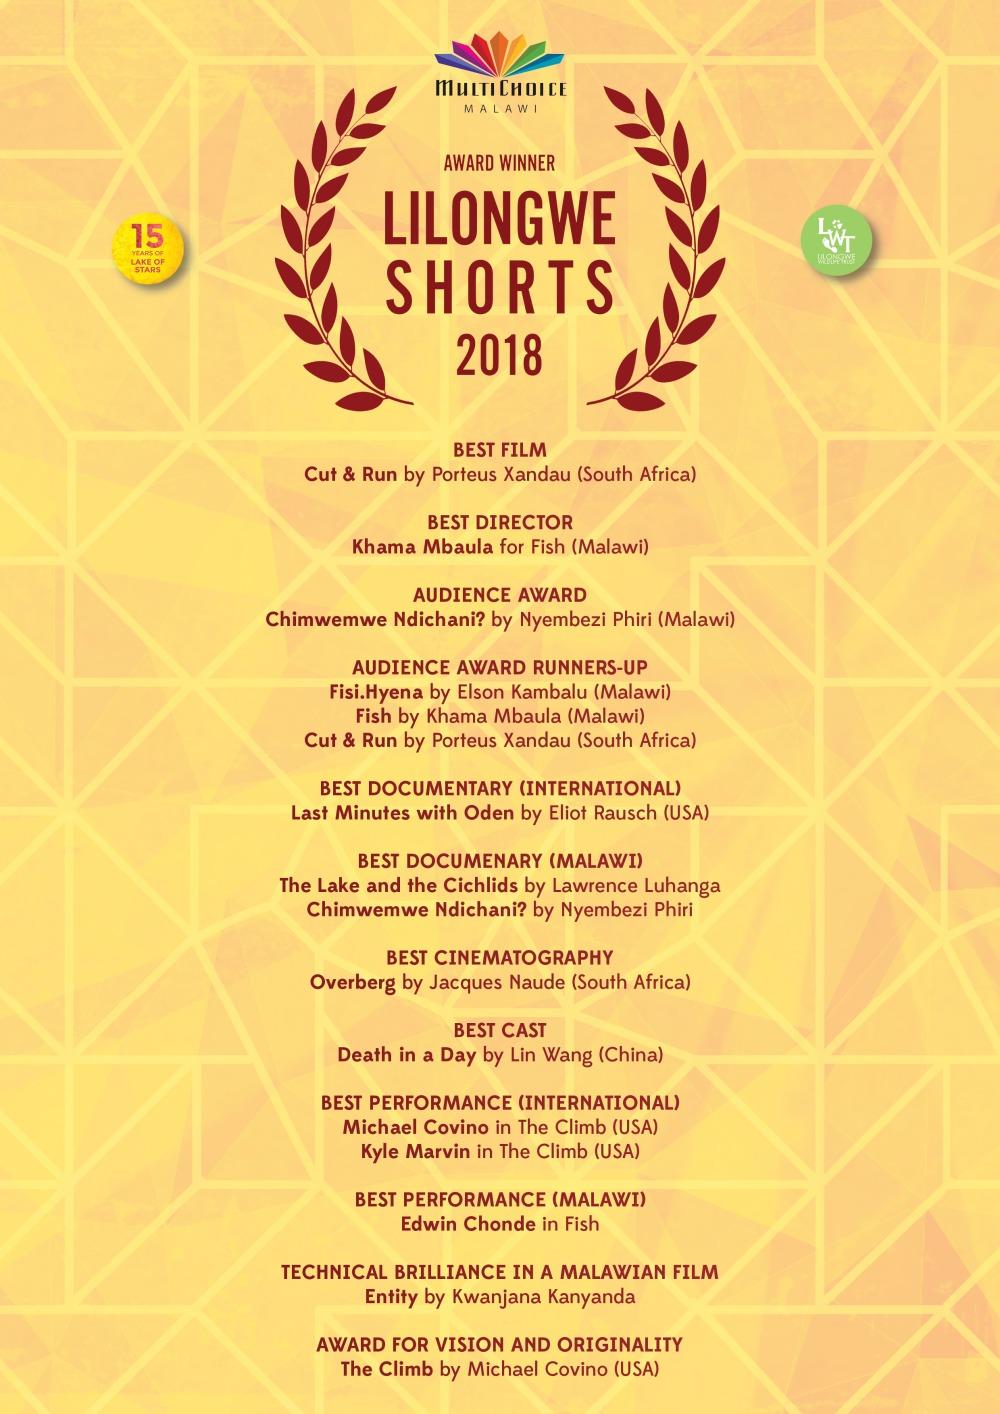 Lilongwe Shorts 2018 Award Winners v2